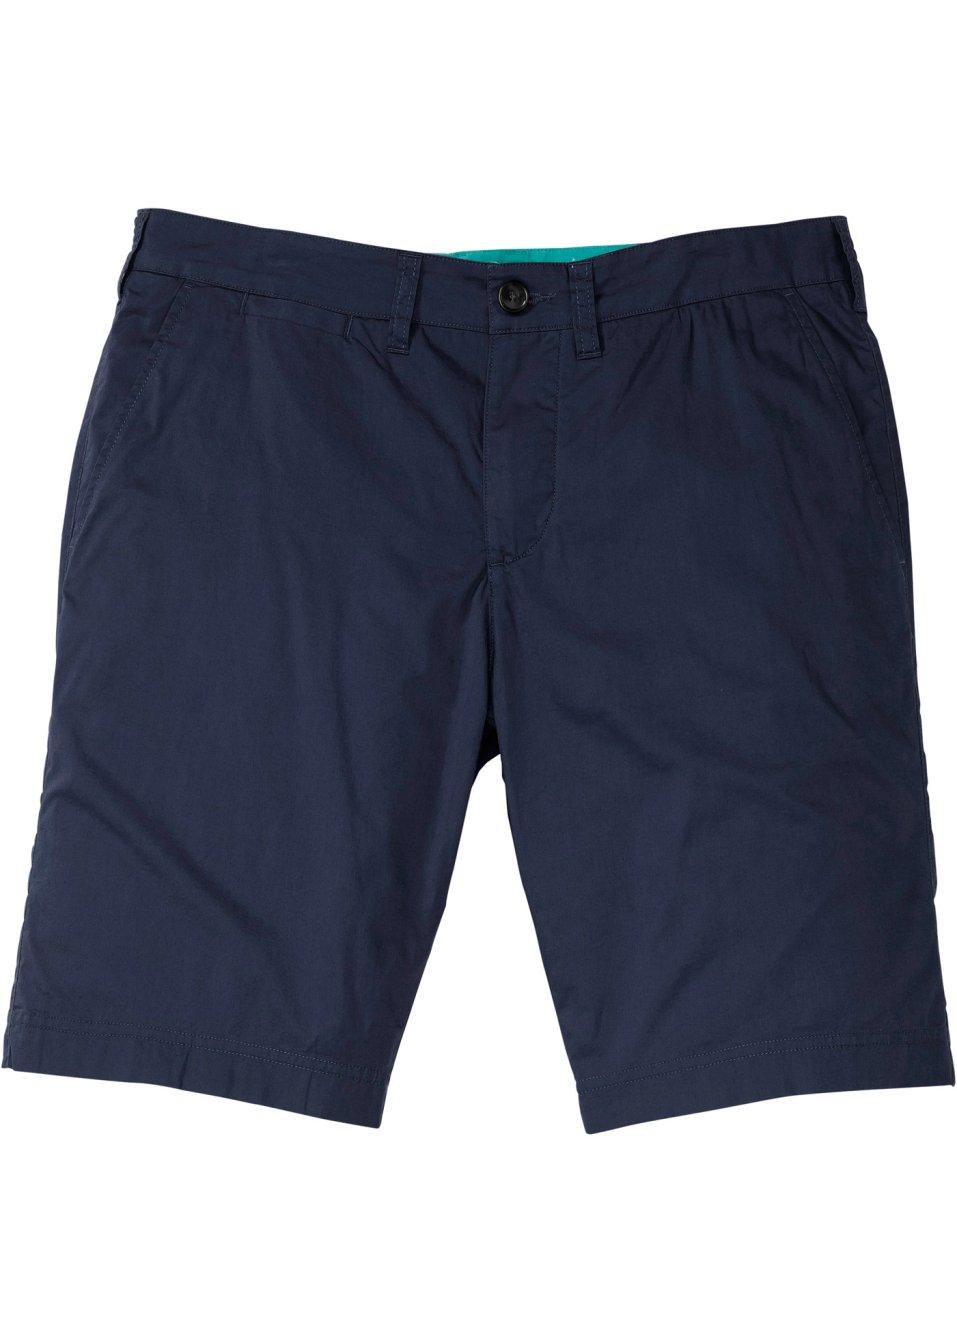 Modische Herren Chino-Bermuda - dunkelblau PkmQn sIWtS